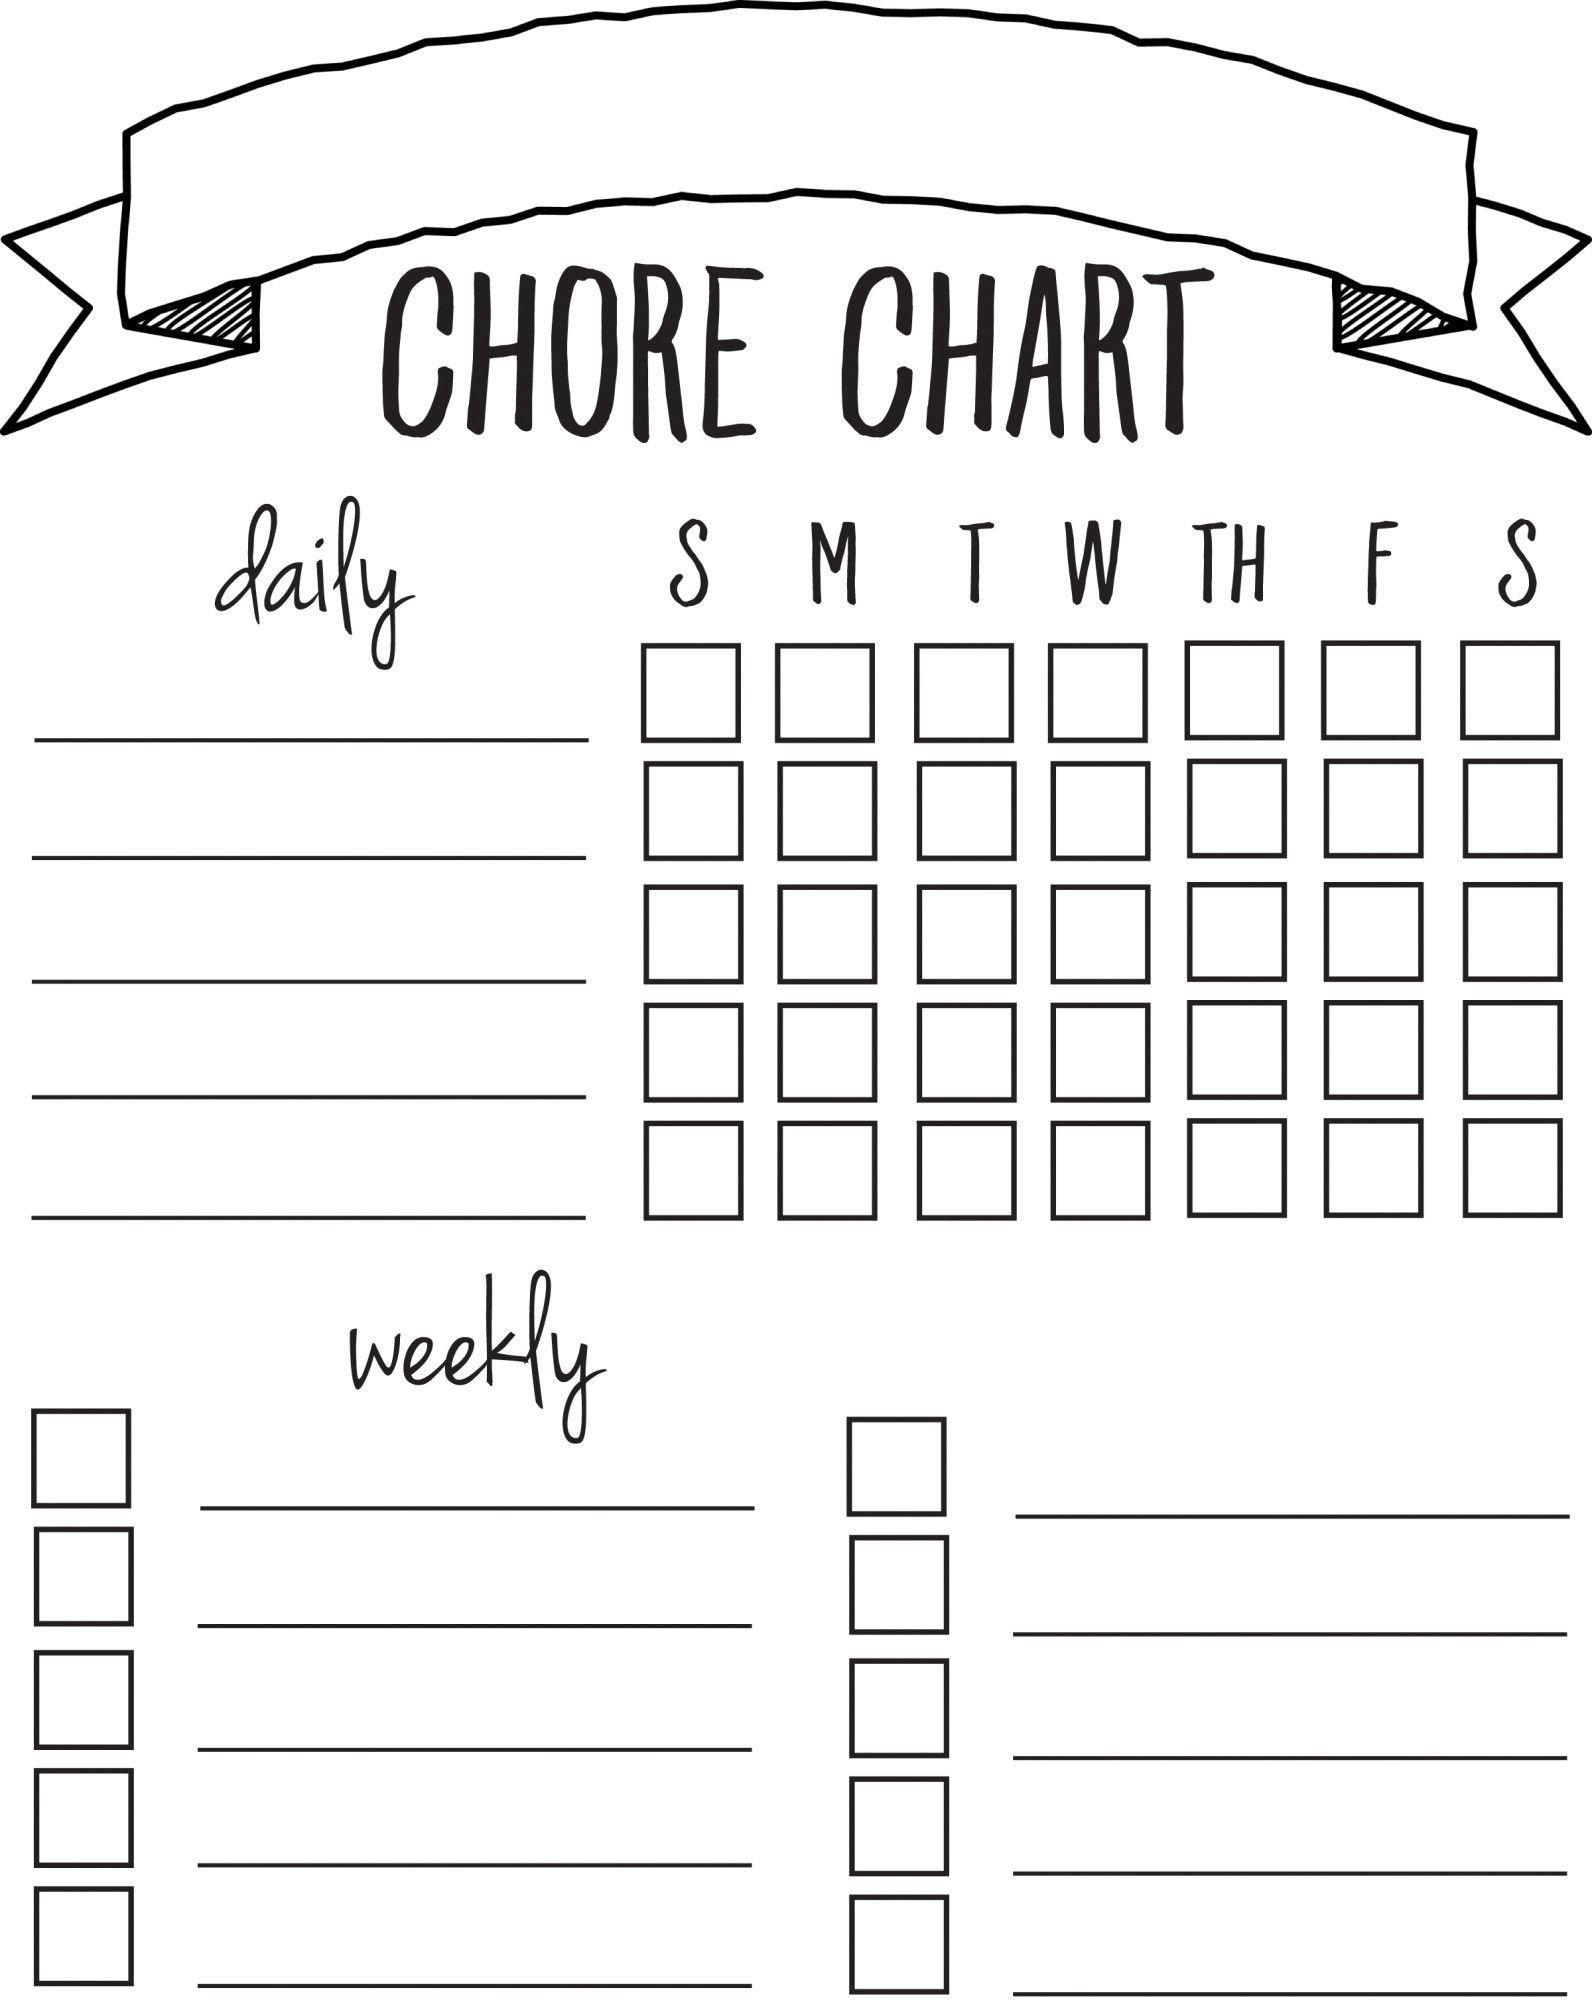 Free Printable Chore Chart Templates Diy Printable Chore Chart